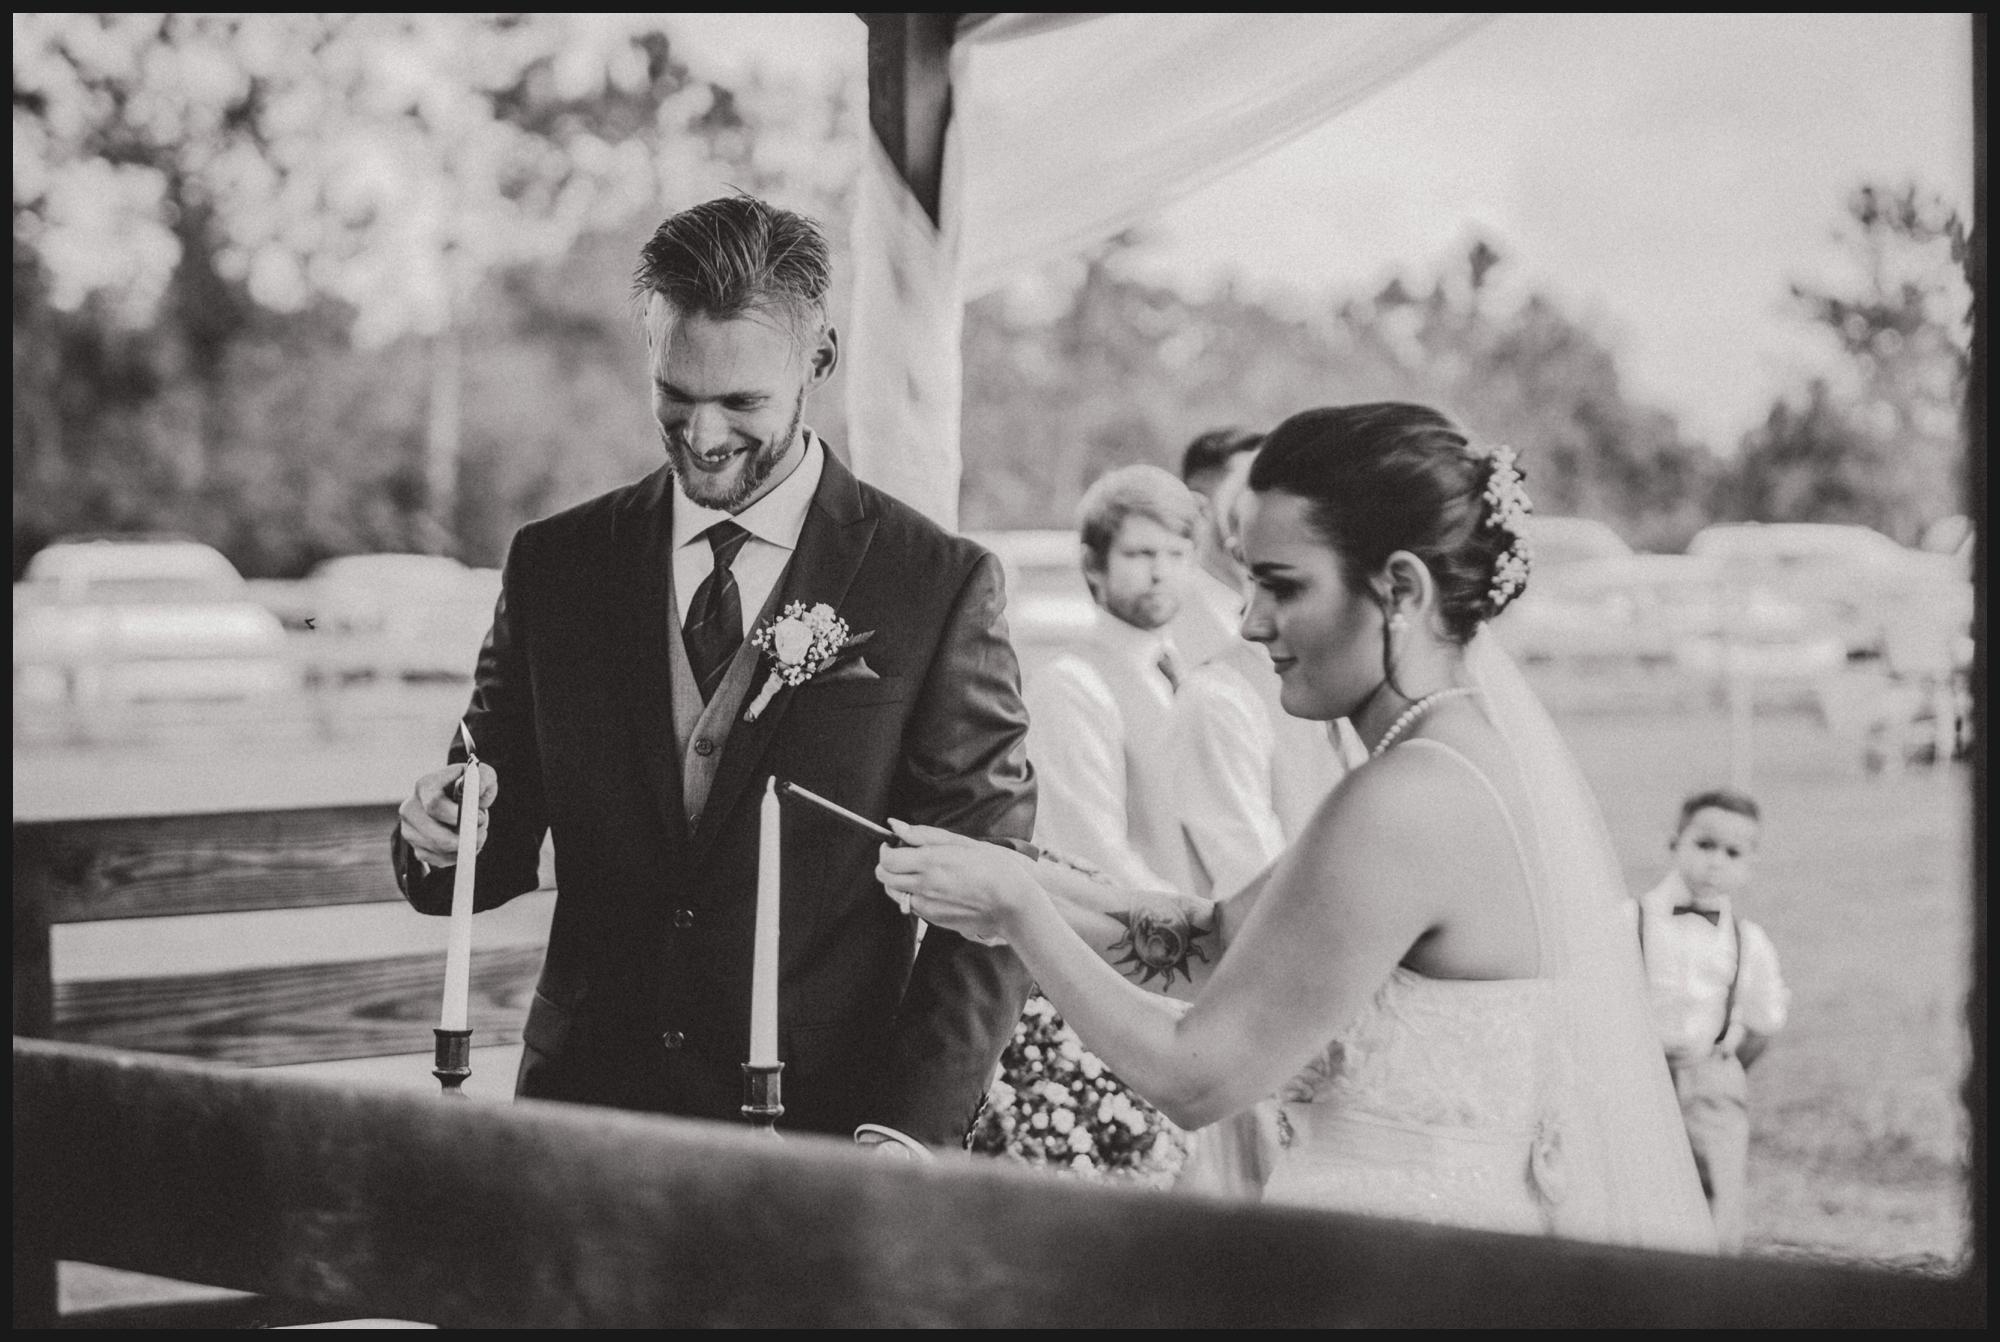 Orlando-Wedding-Photographer-destination-wedding-photographer-florida-wedding-photographer-bohemian-wedding-photographer_0347.jpg